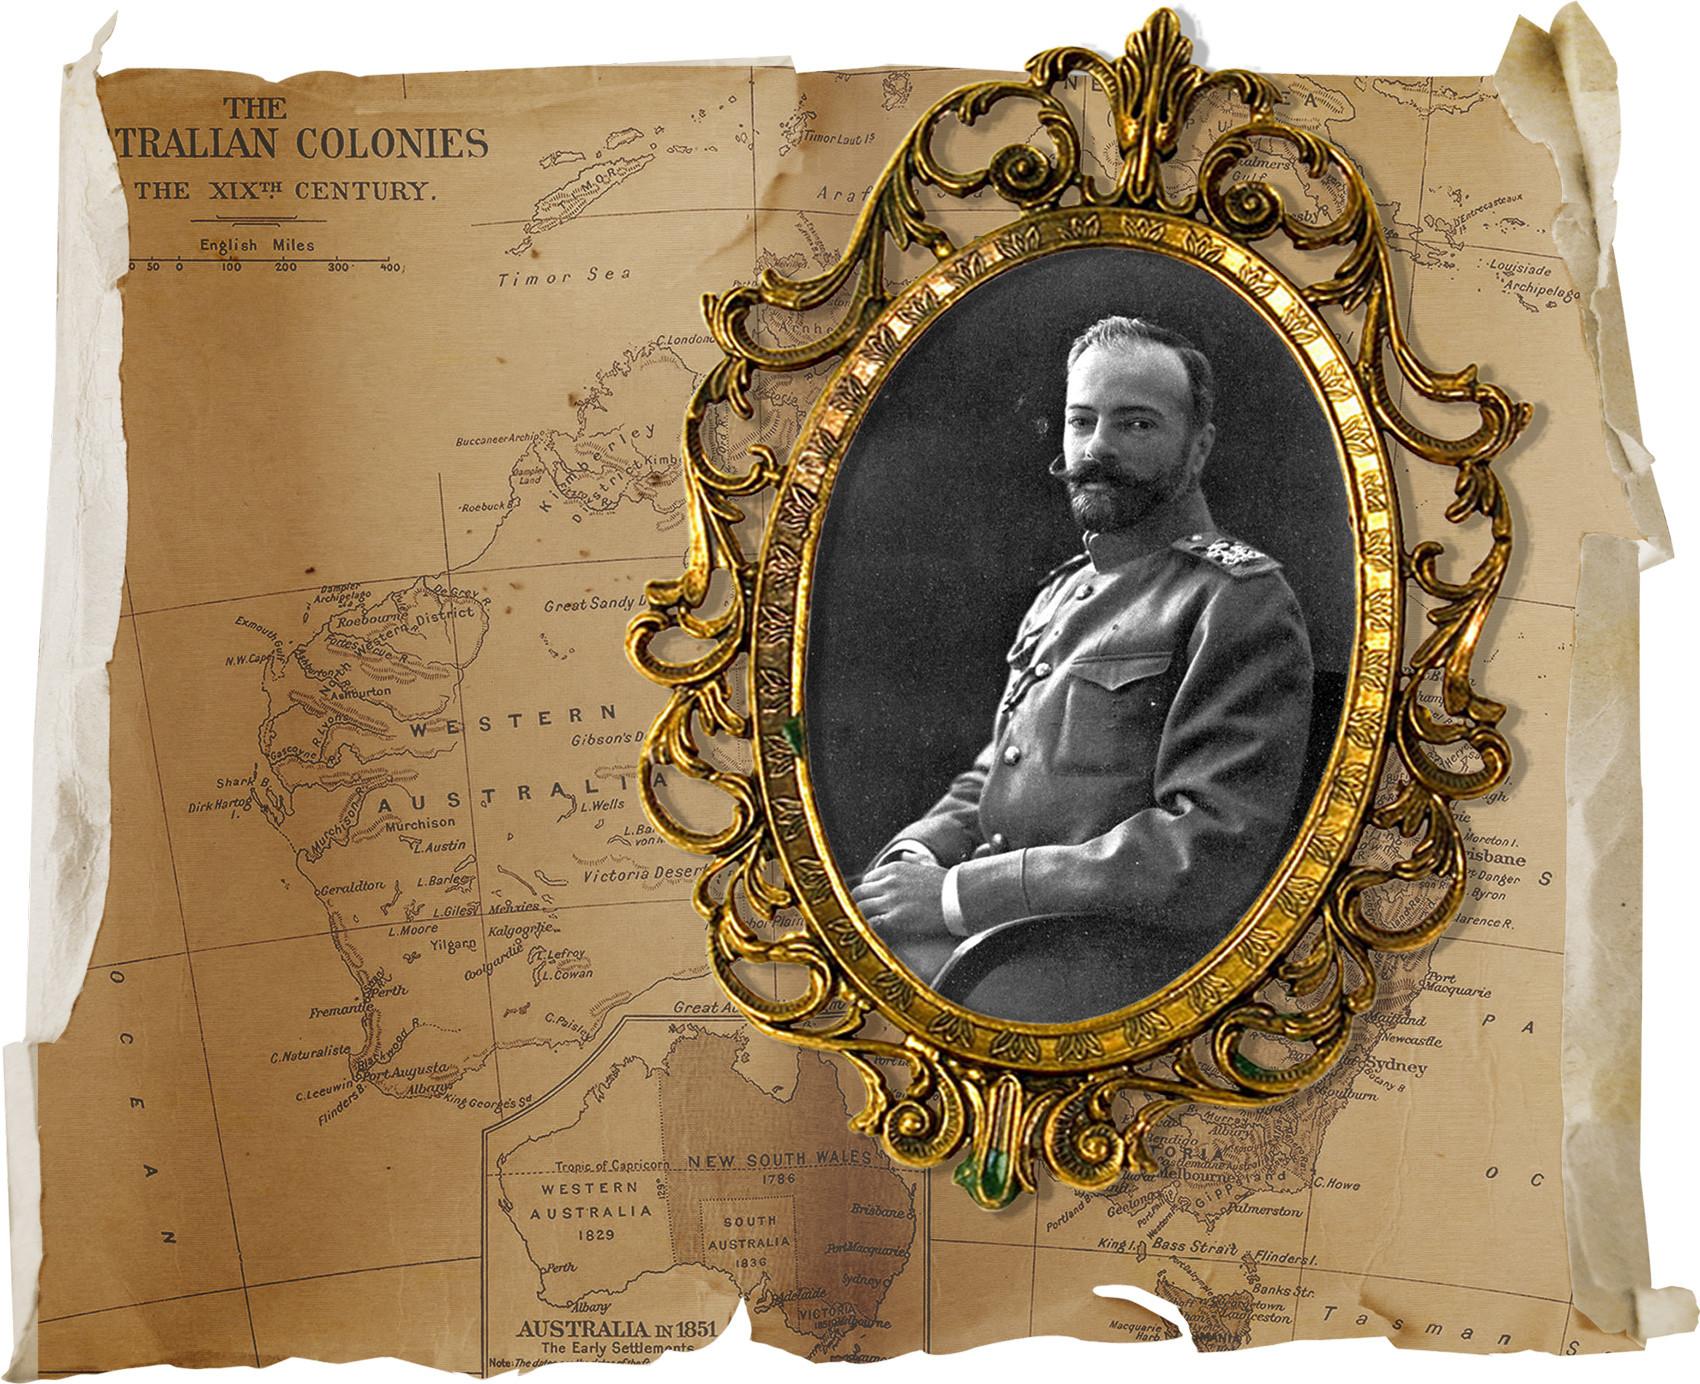 Grand Duke Alexander Mikhailovich of Russia (1866 – 1933)